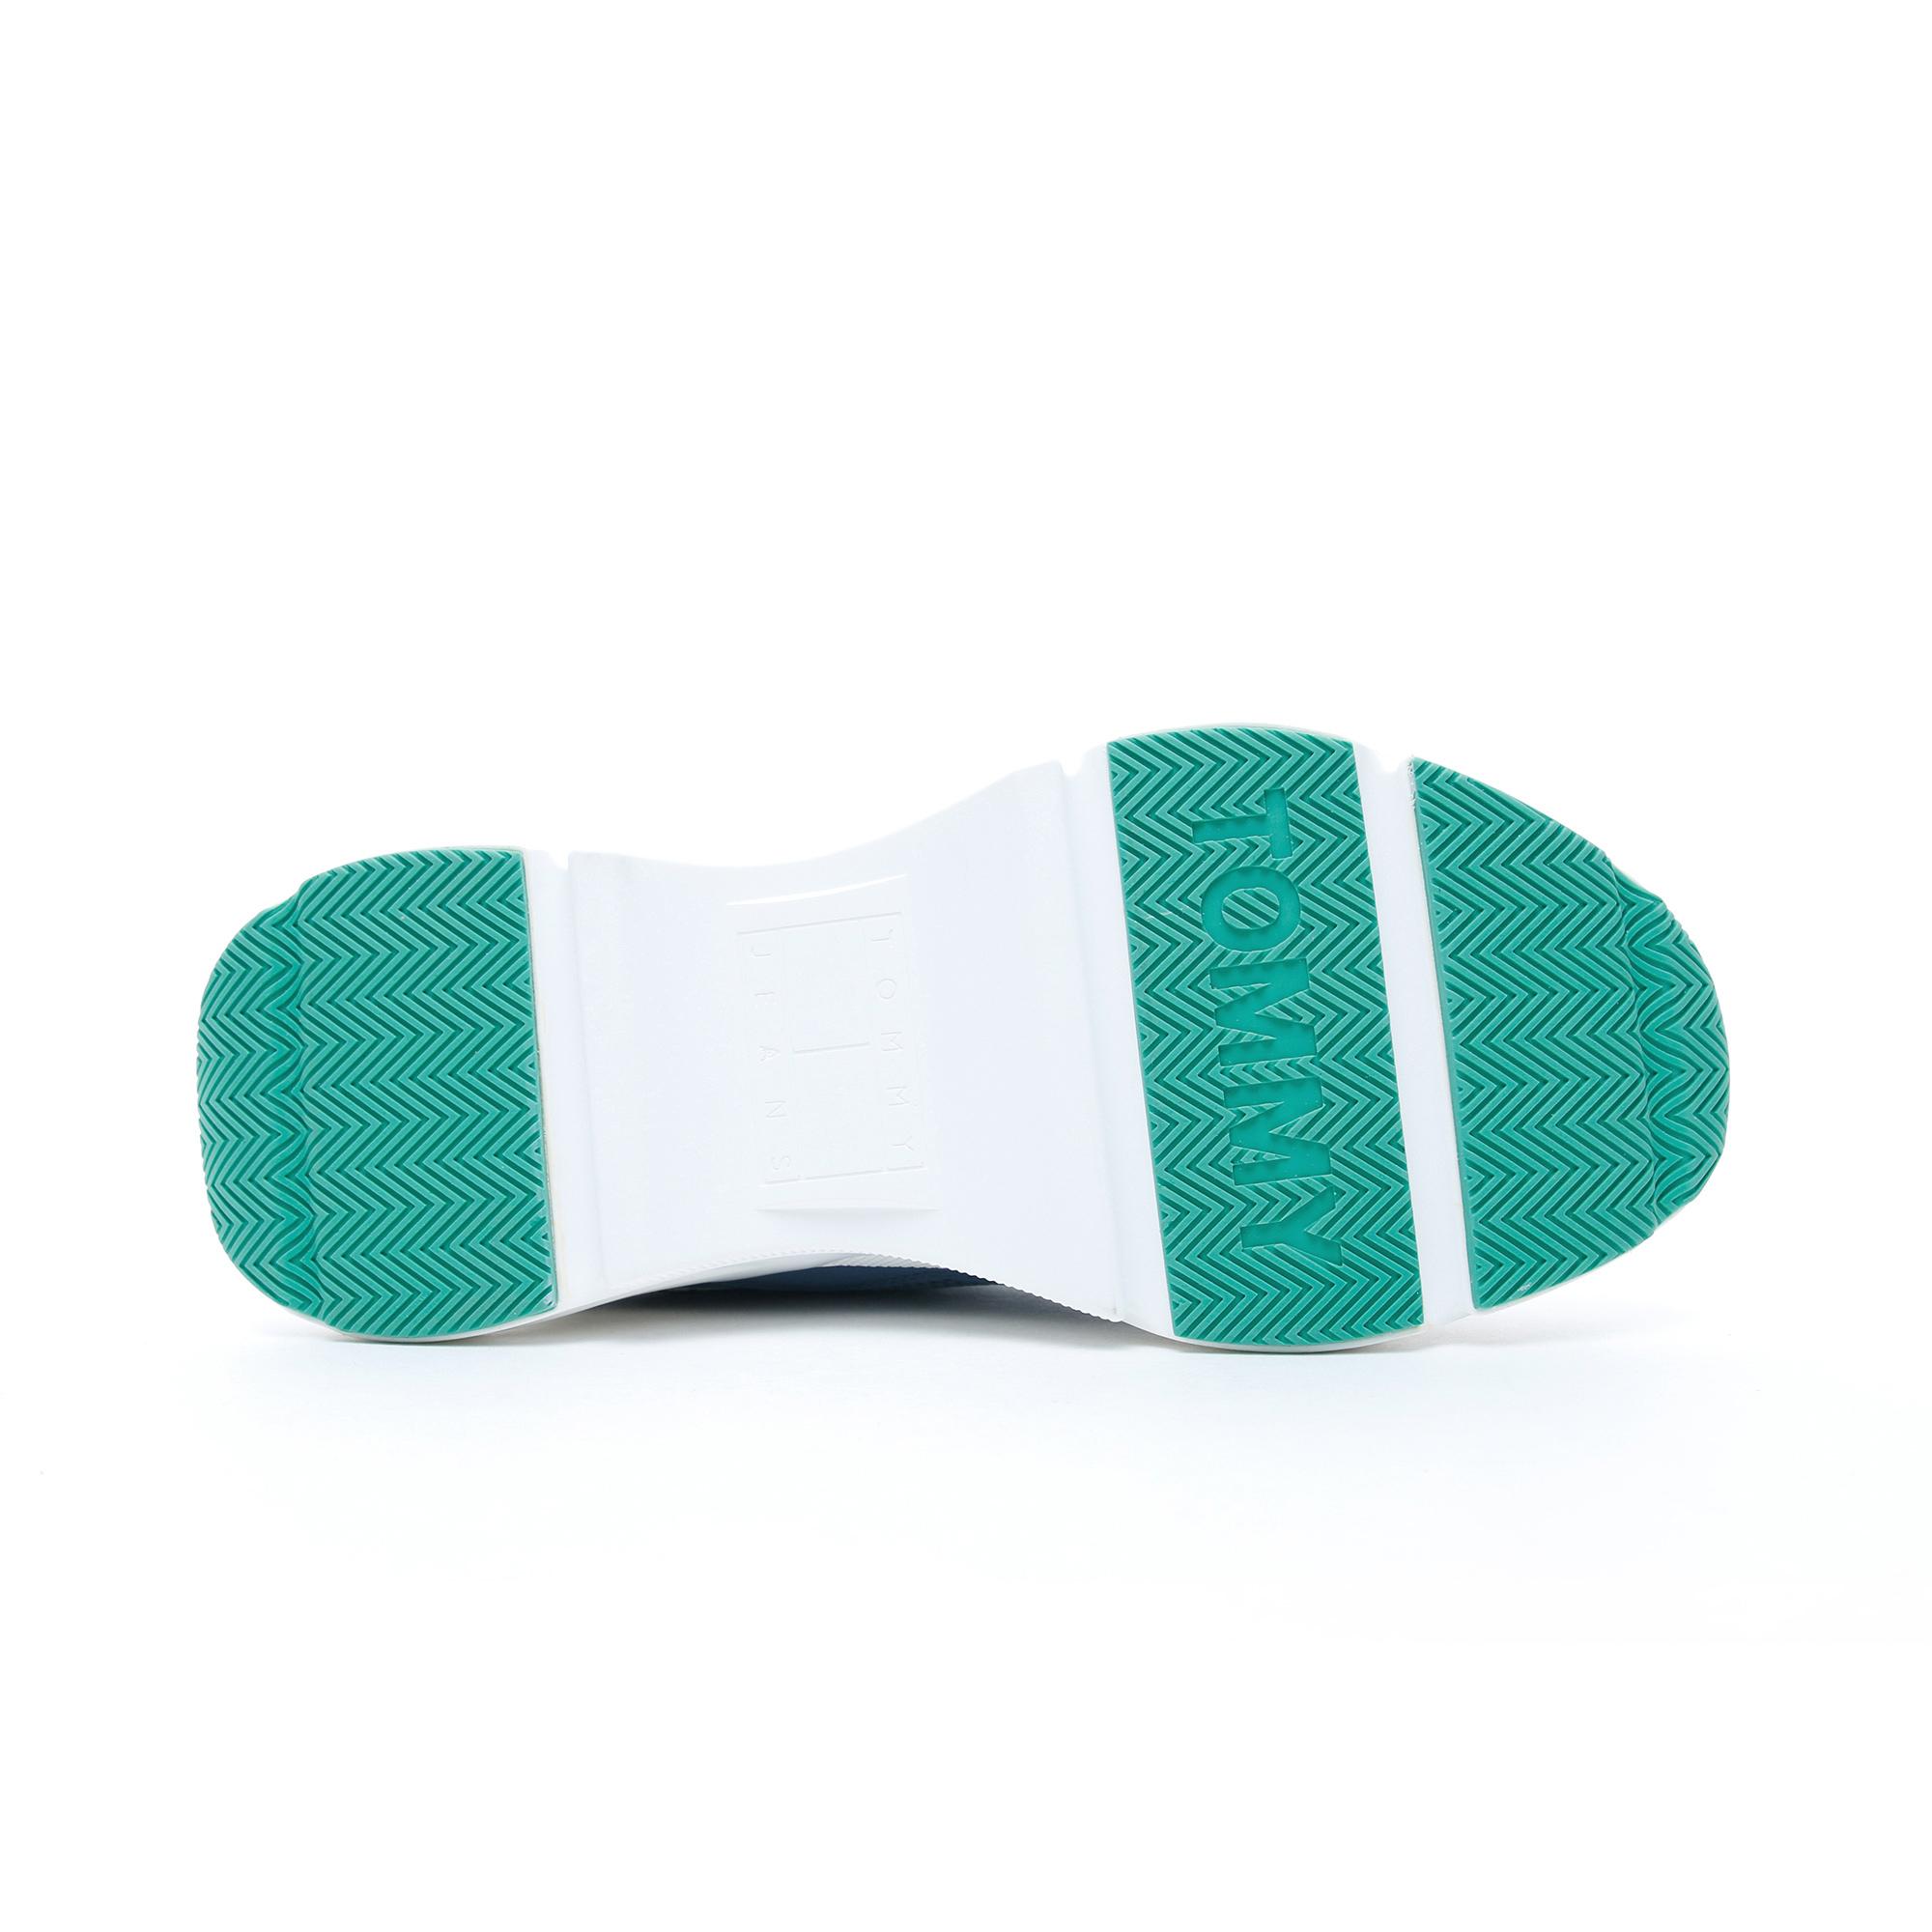 Tommy Hilfiger Fashion Chunky Erkek Lacivert Spor Ayakkabı